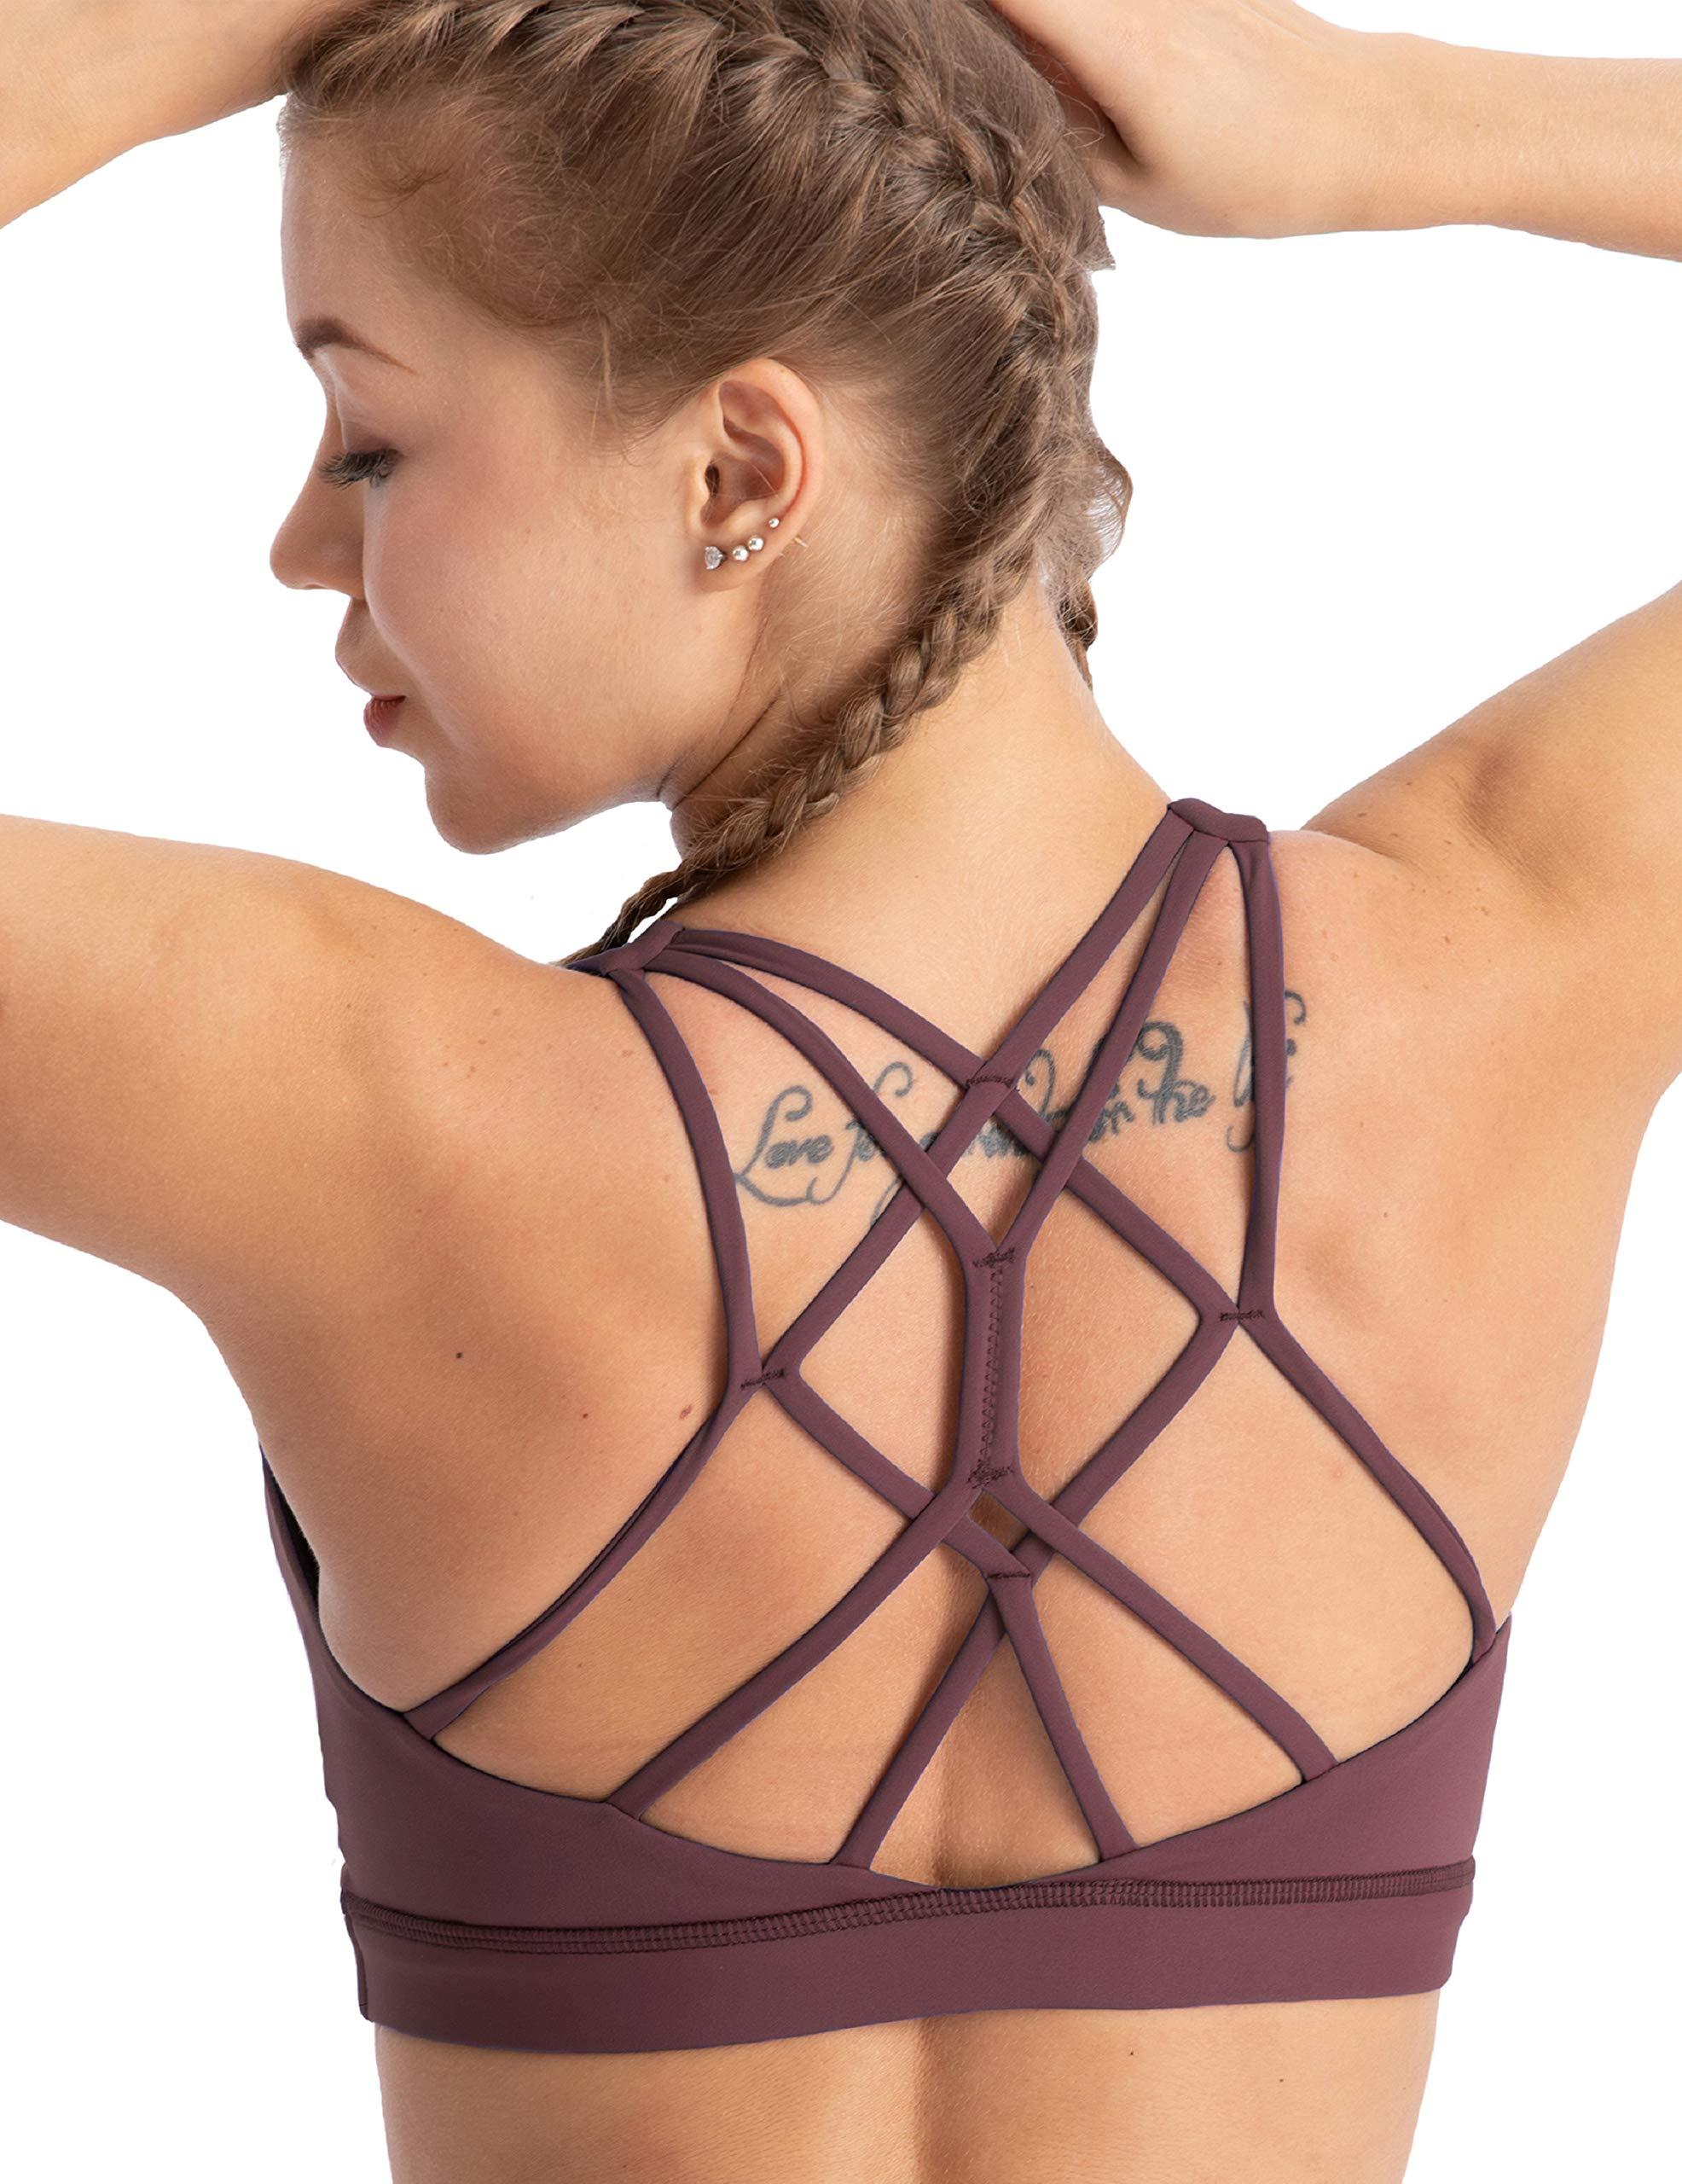 coastal rose Women's Yoga Bra Top Strappy Back Push Up Crop Sports Bra Activewear US XS Port Royale by coastal rose